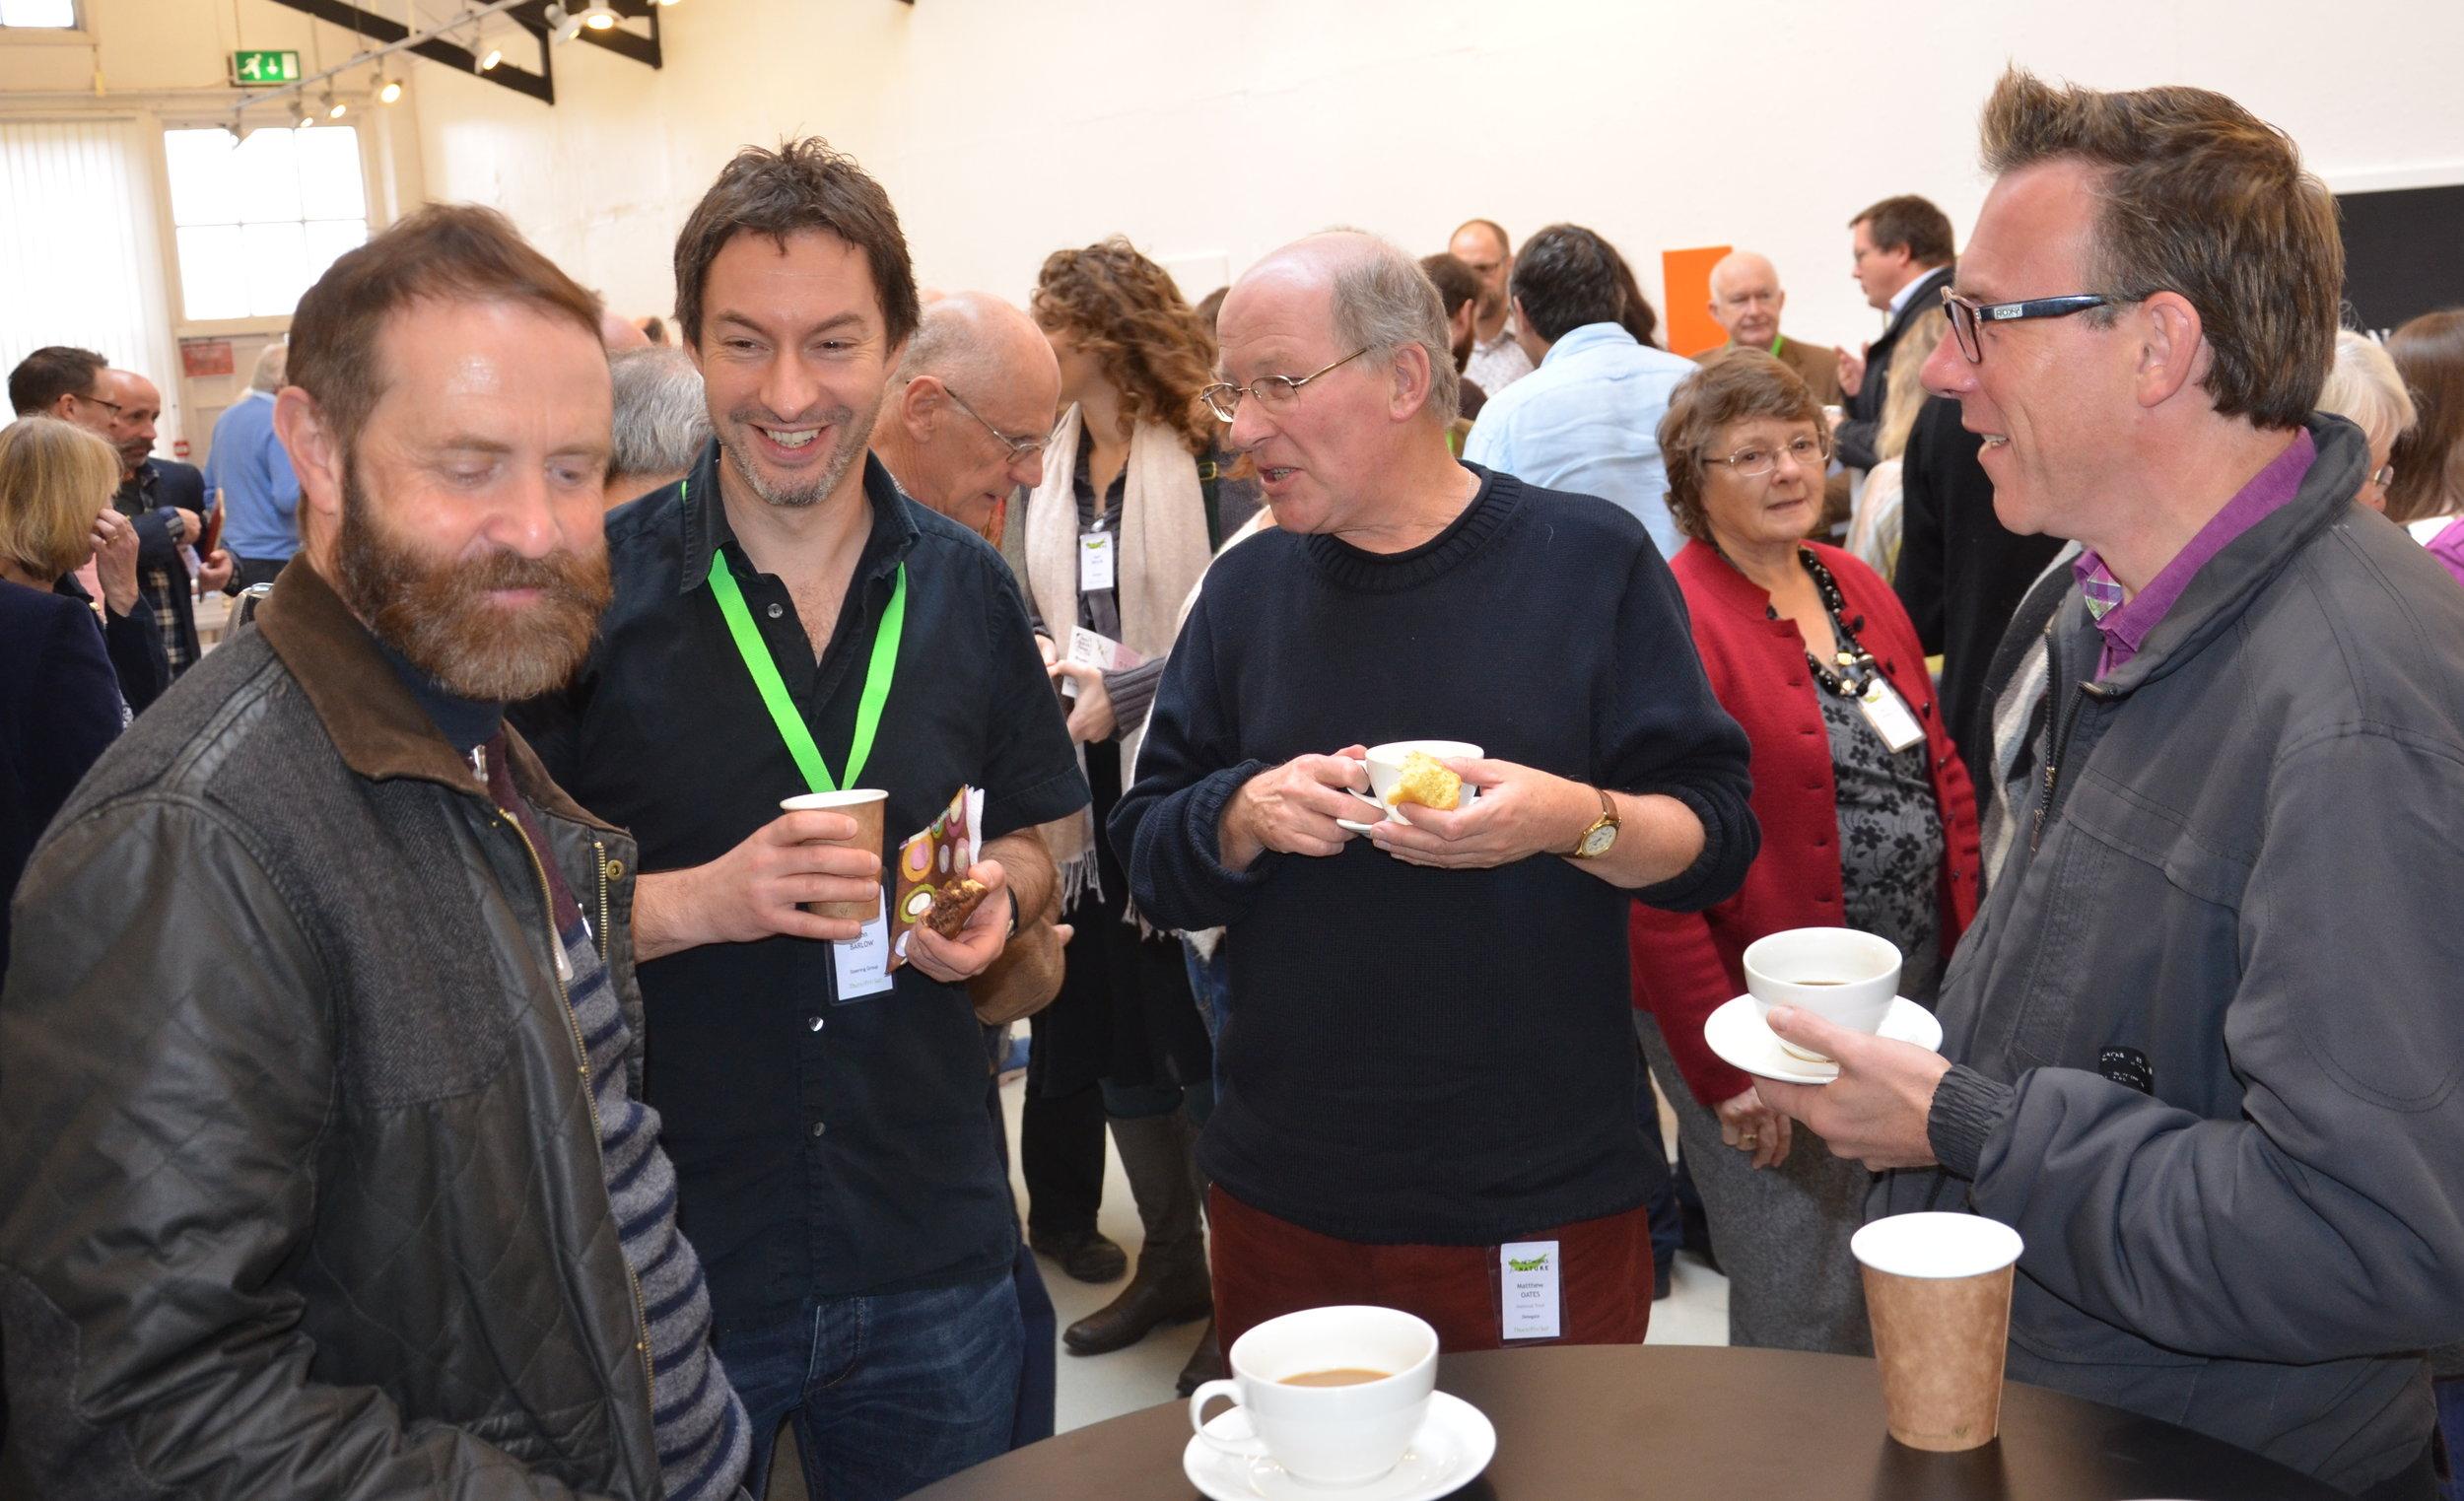 L–R: Simon Chard, John Barlow, Matthew Oates and Matthew Paul © Carry Akroyd